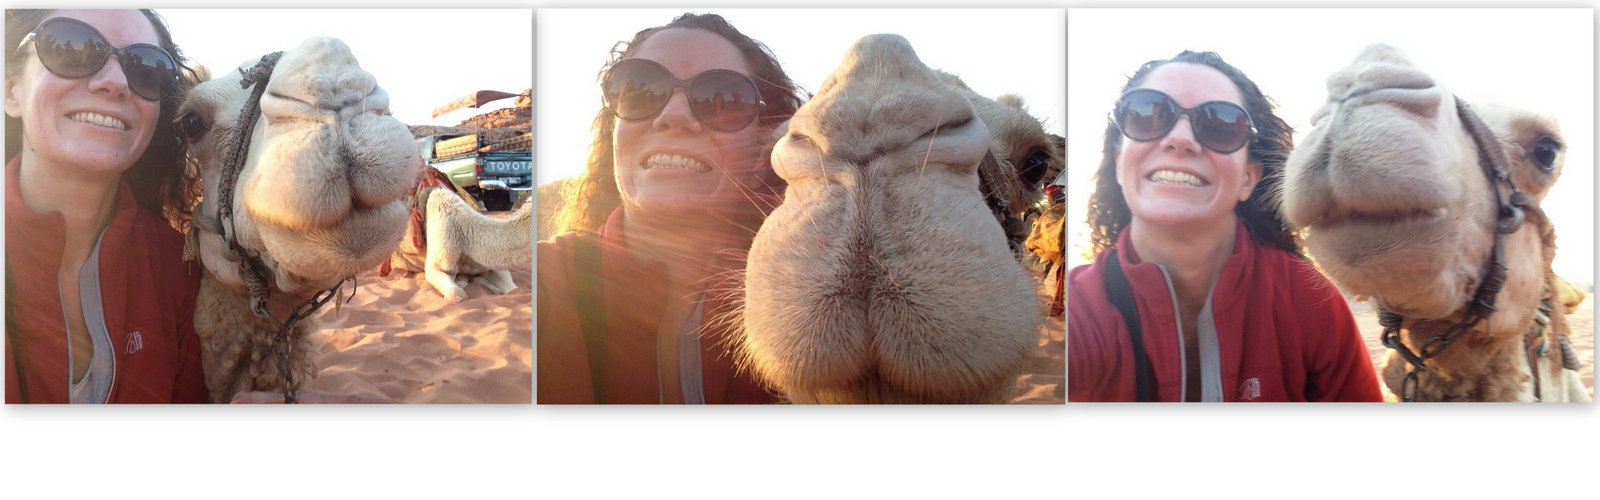 reussir un selfie dromadaire jordanie